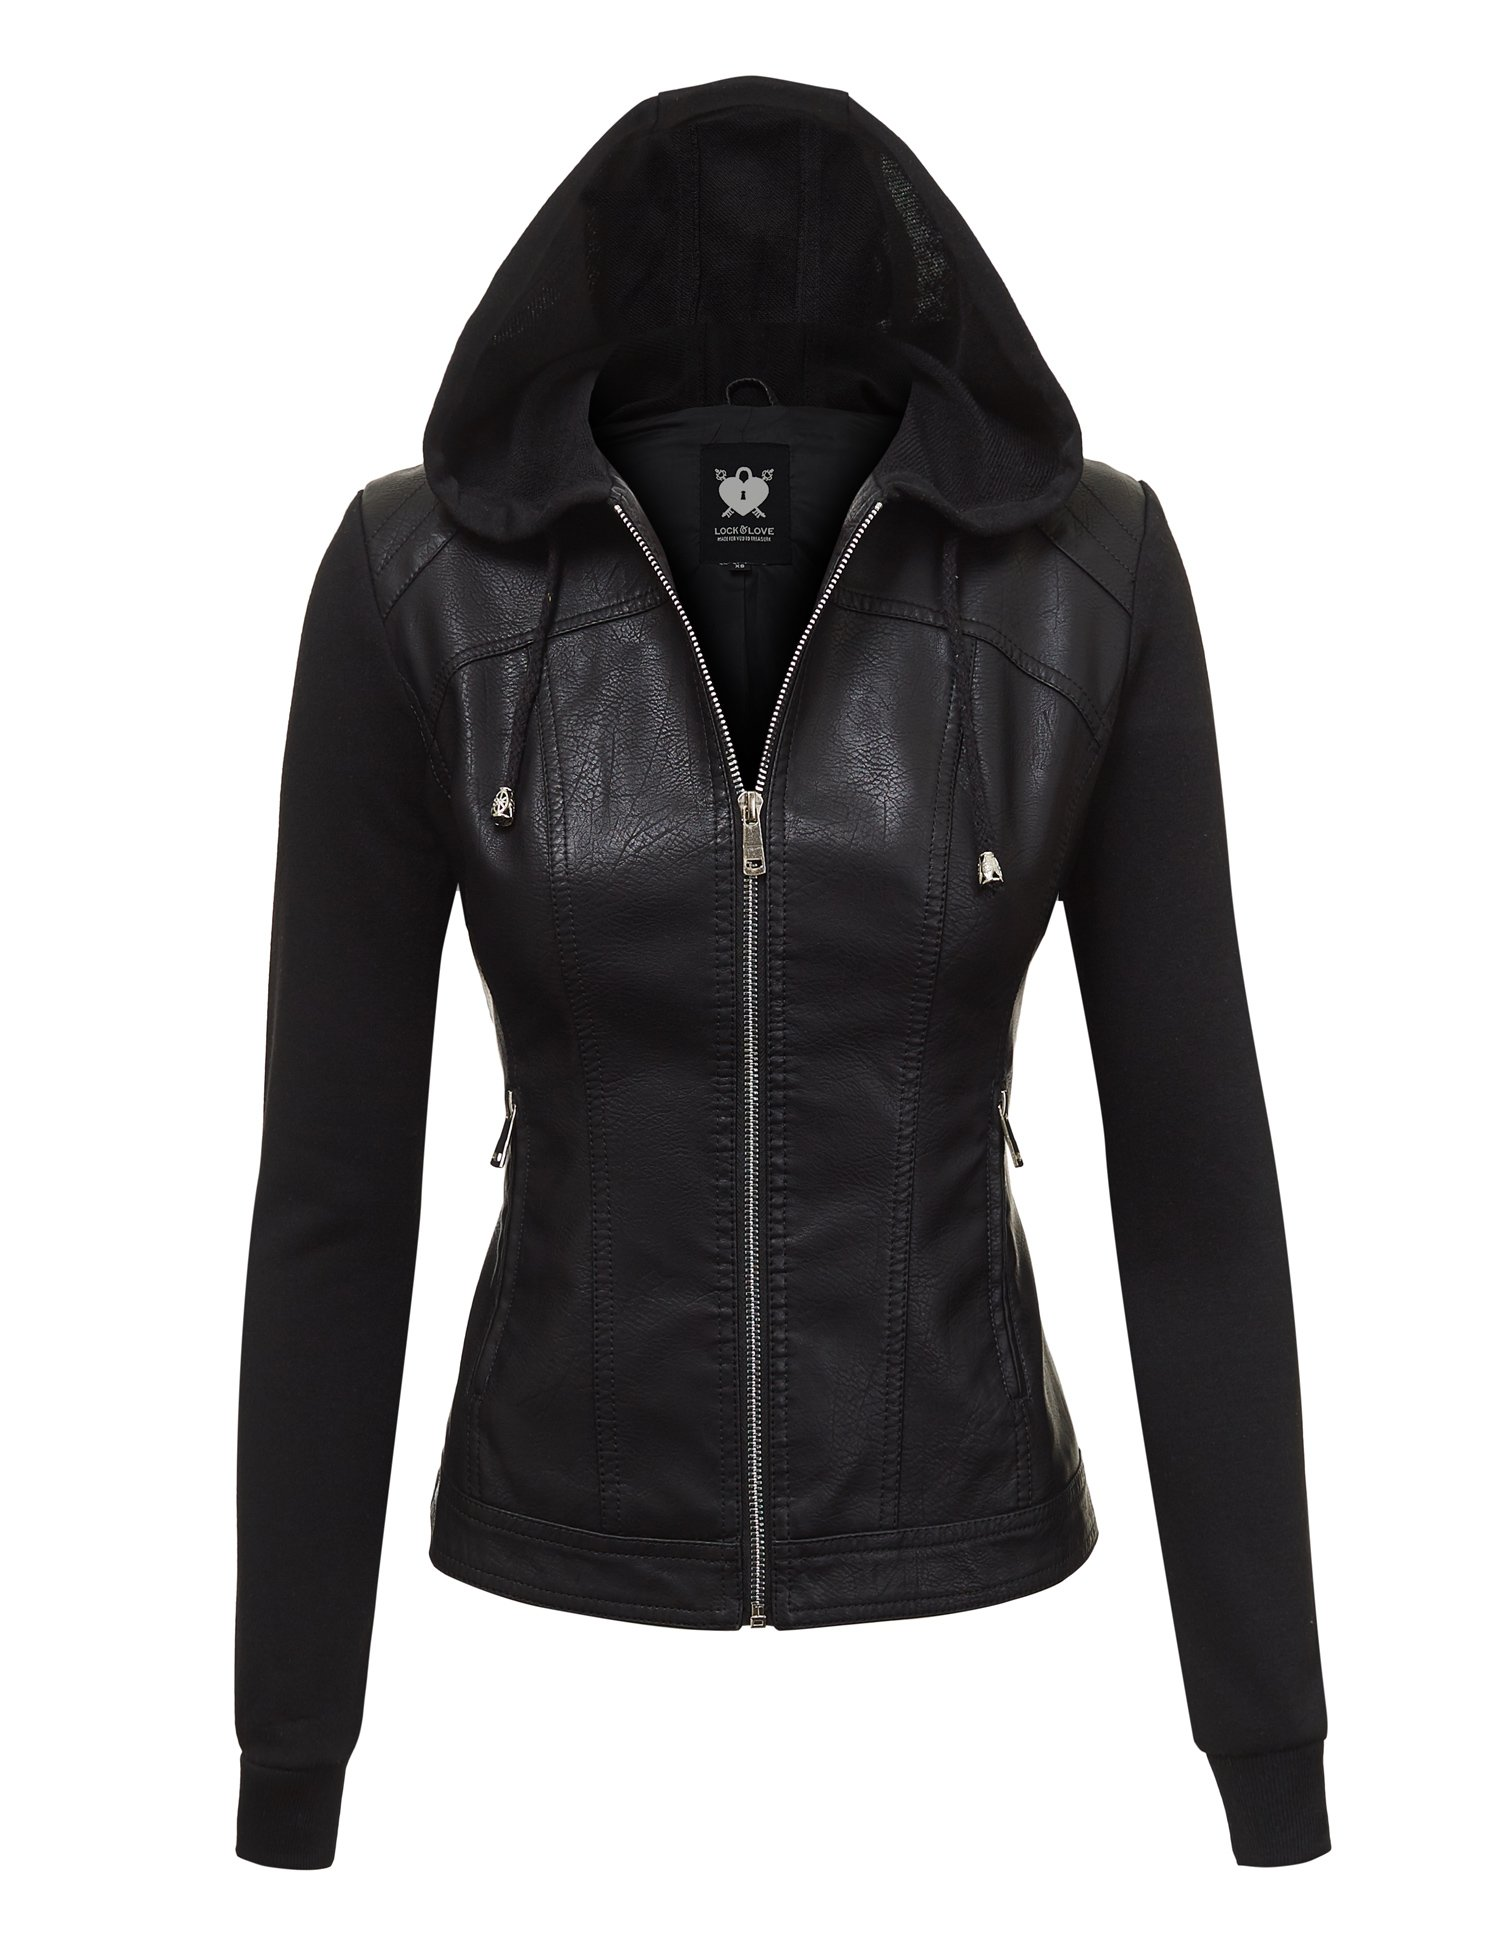 WJC1347 Womens Faux Leather Zip Up Moto Biker Jacket With Hoodie XXL Black_Black